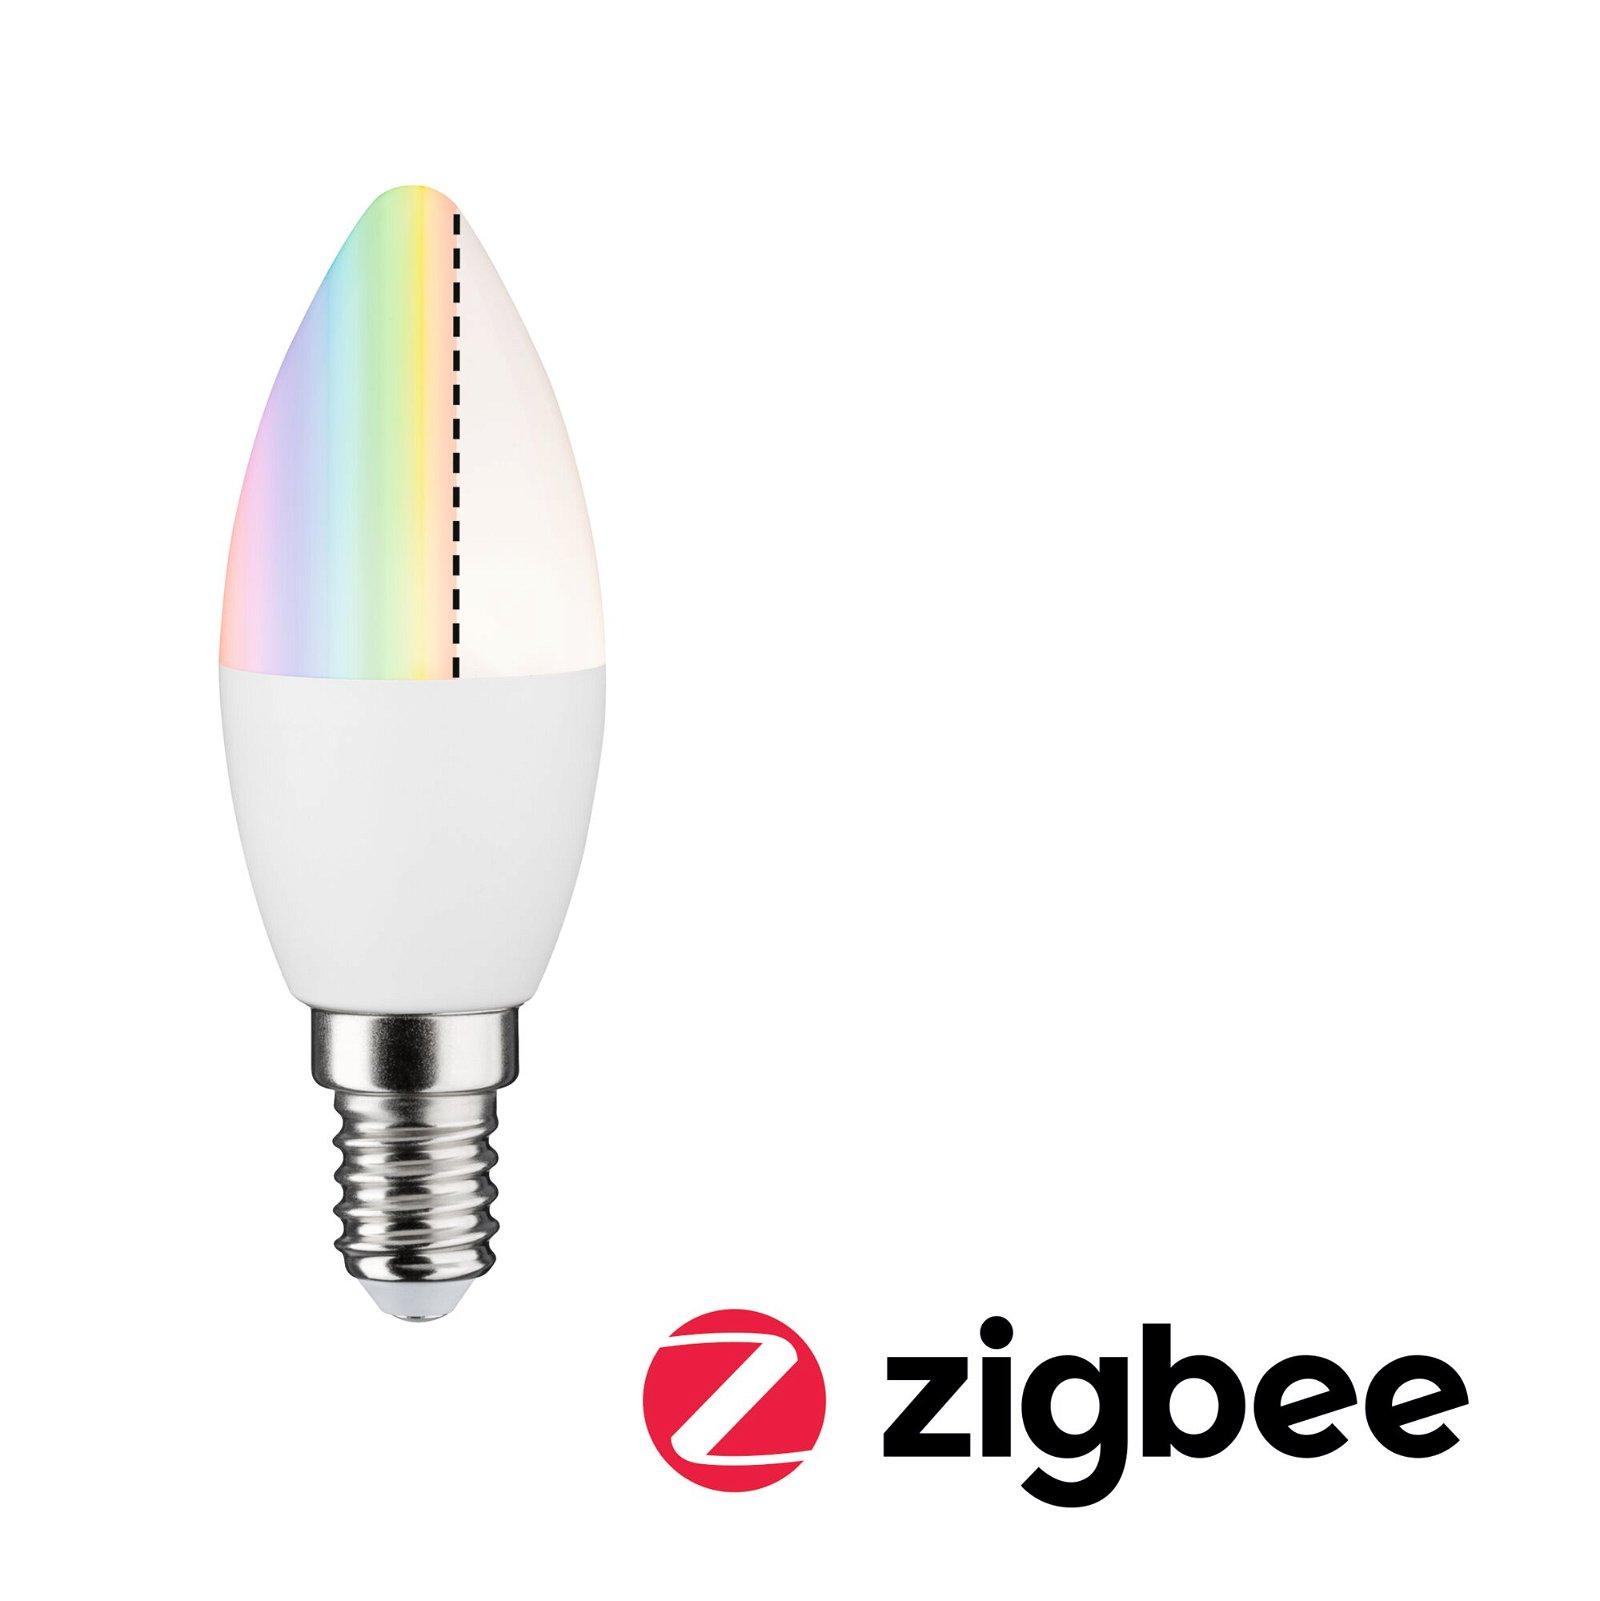 LED Kerze Smart Home Zigbee E14 230V 470lm 6,3W RGBW Matt